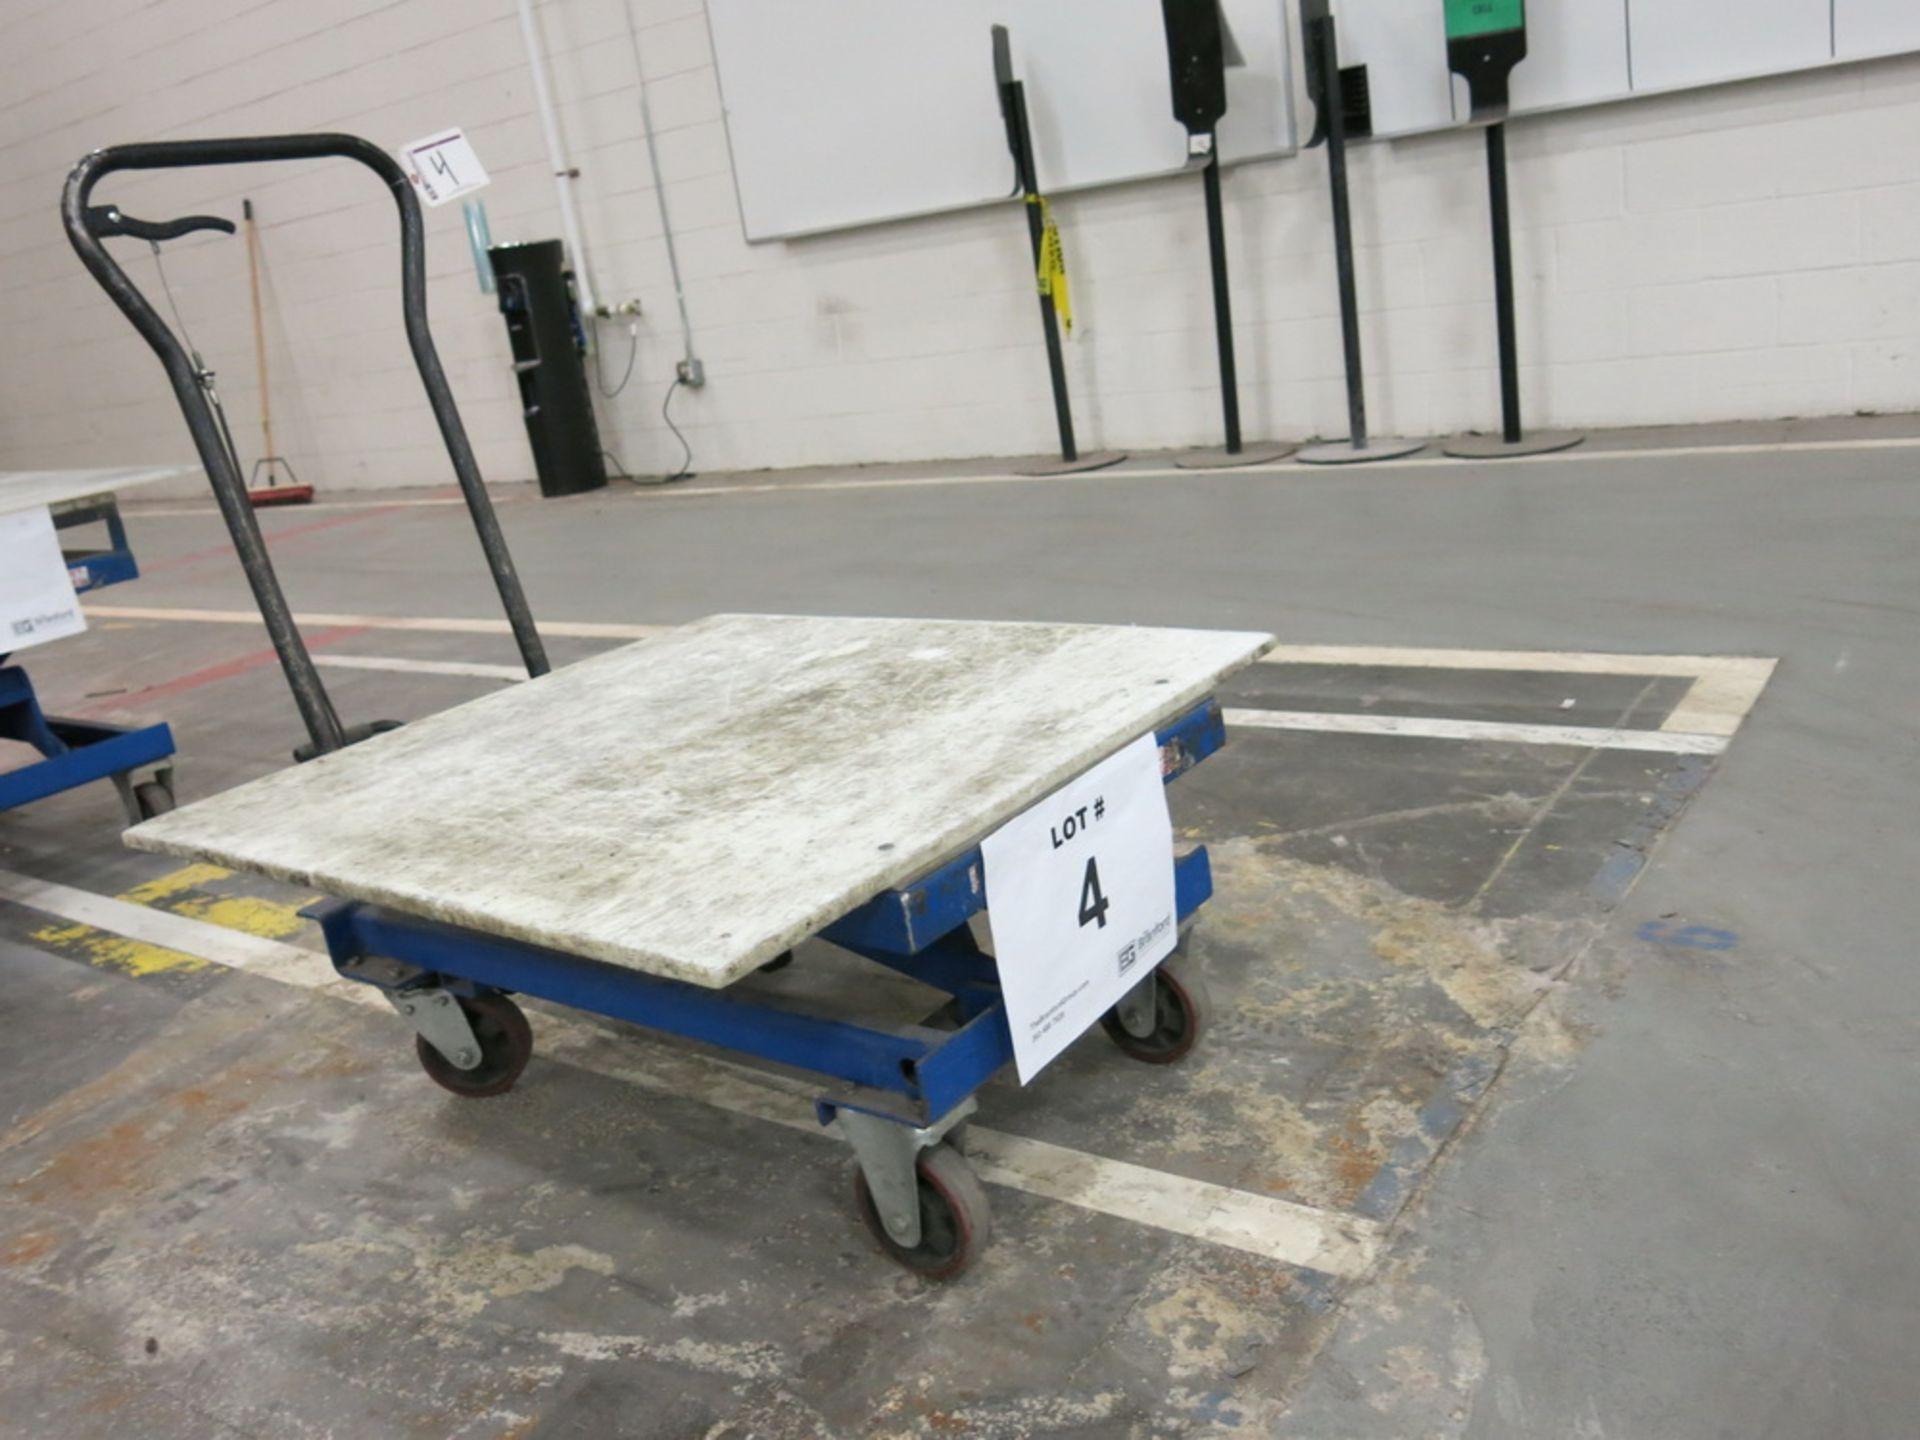 Lot 4 - Lift Table, 1100 lb Cap. Hydraulic Die Lift Cart w/ Polypropylene Top